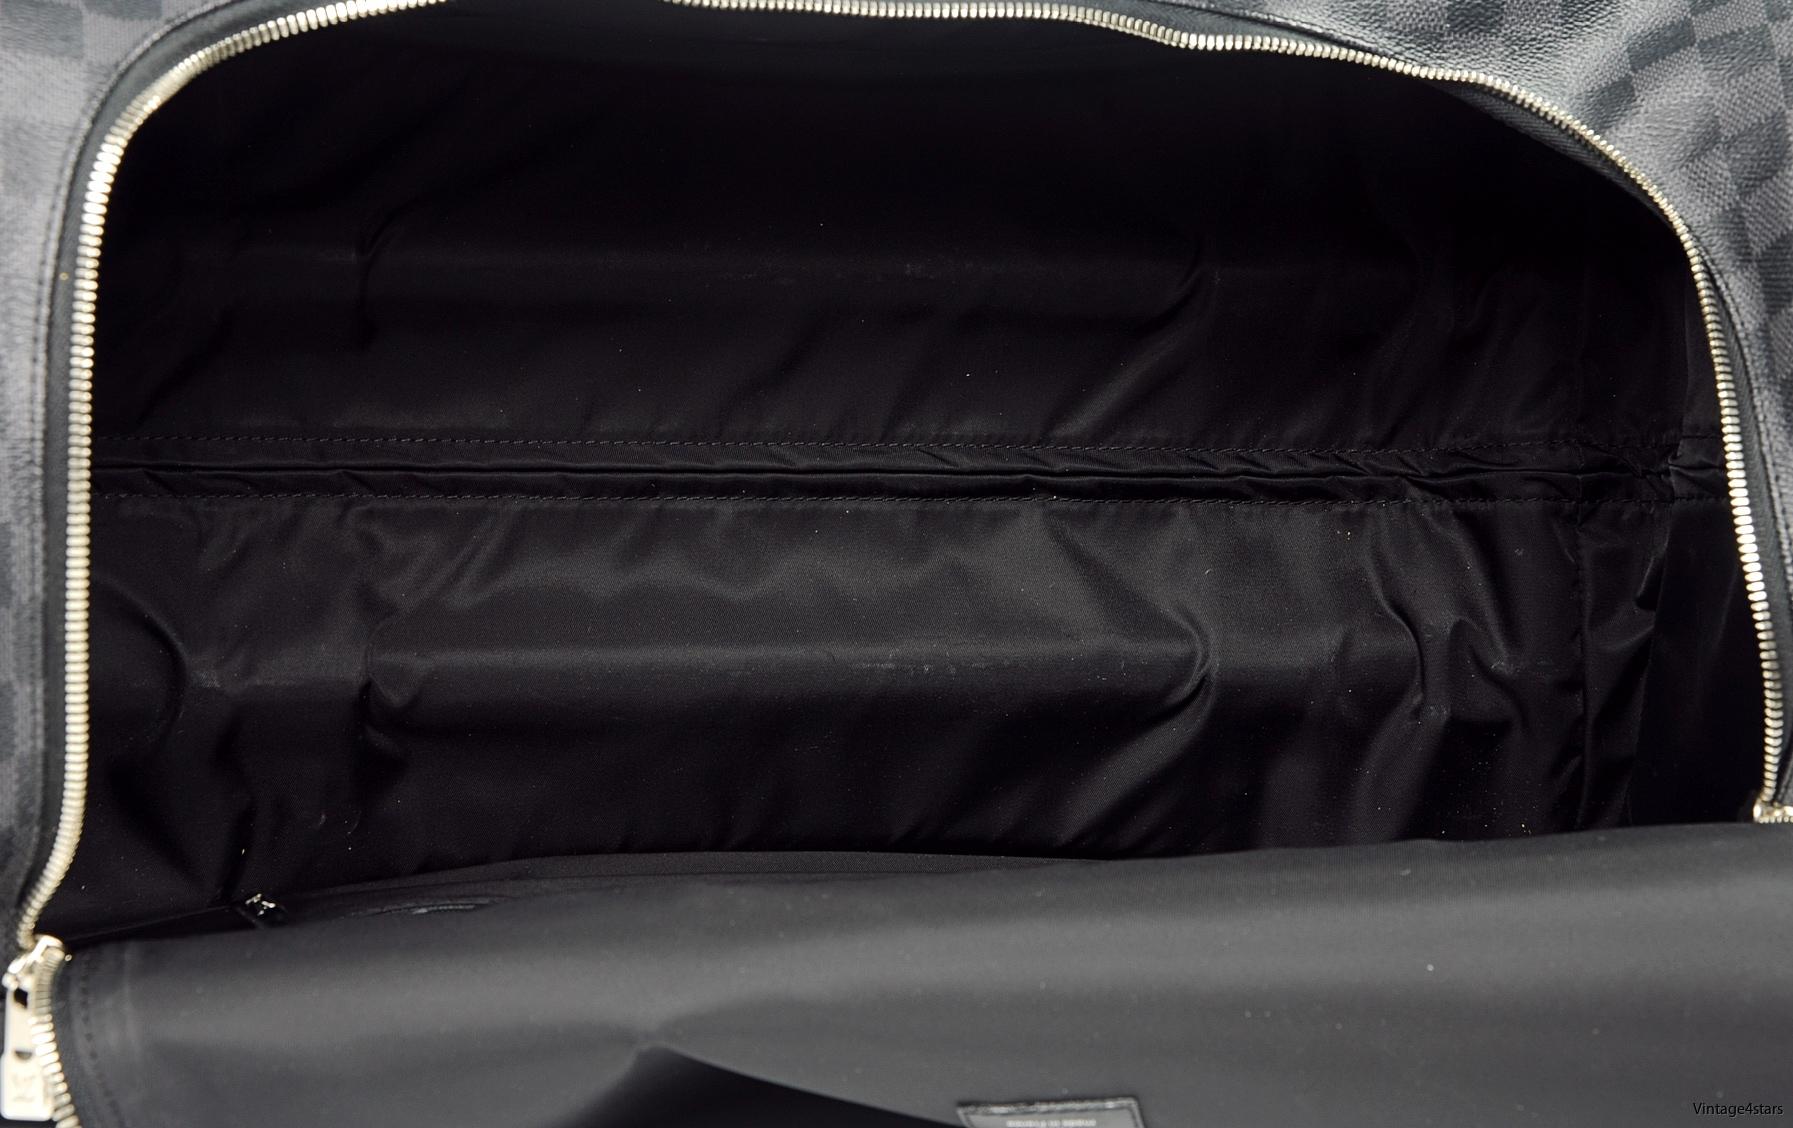 Louis Vuitton Eole 55 NEO Graphite 11